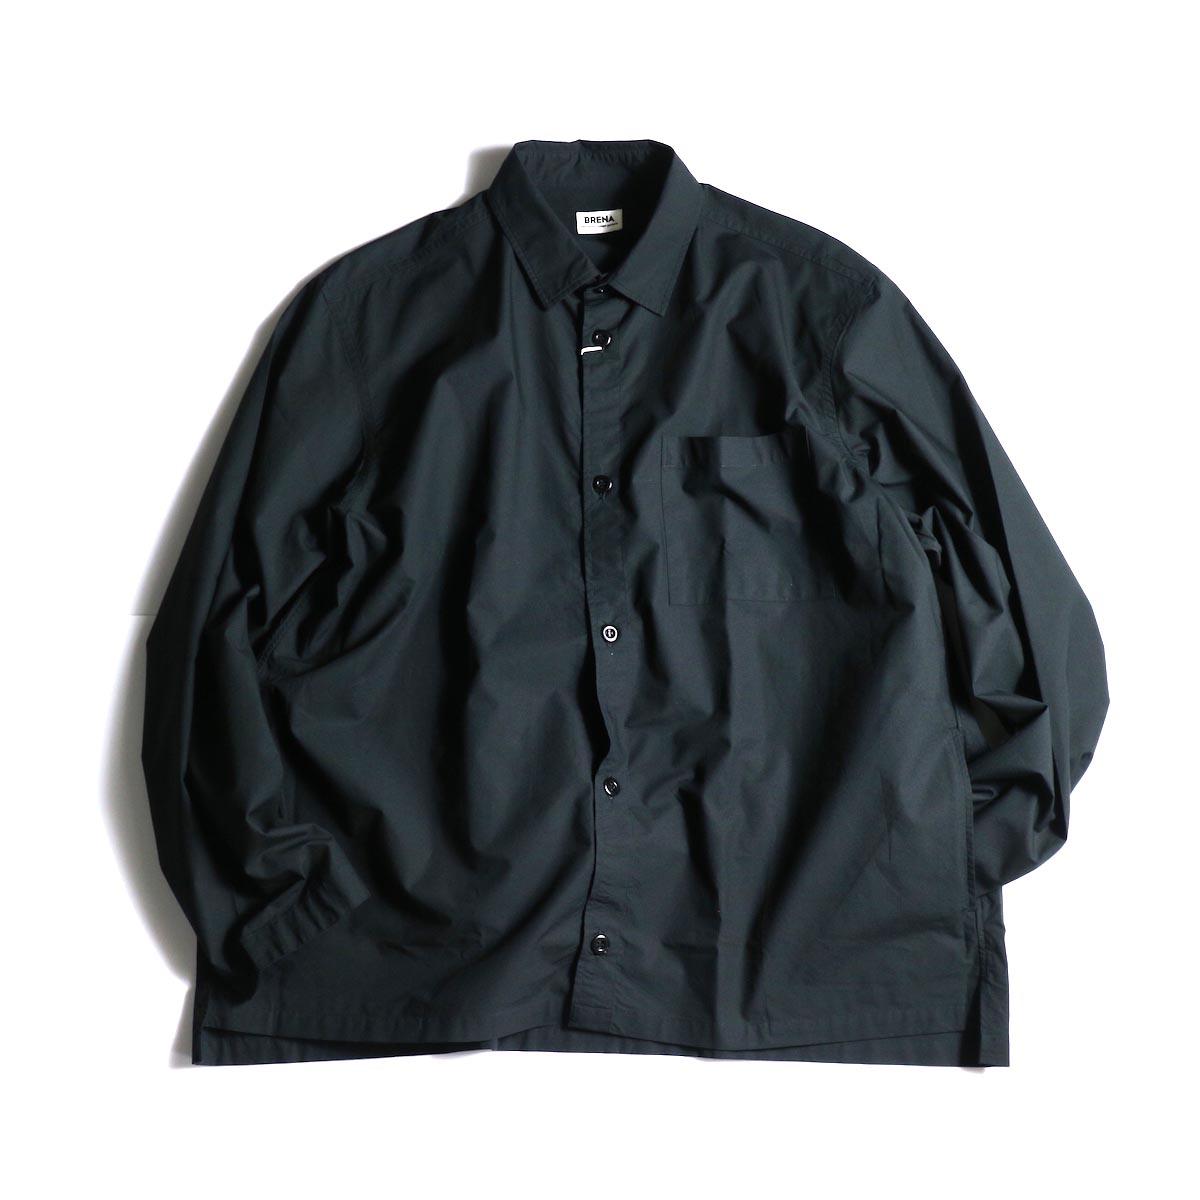 BRENA / Shell (Black)